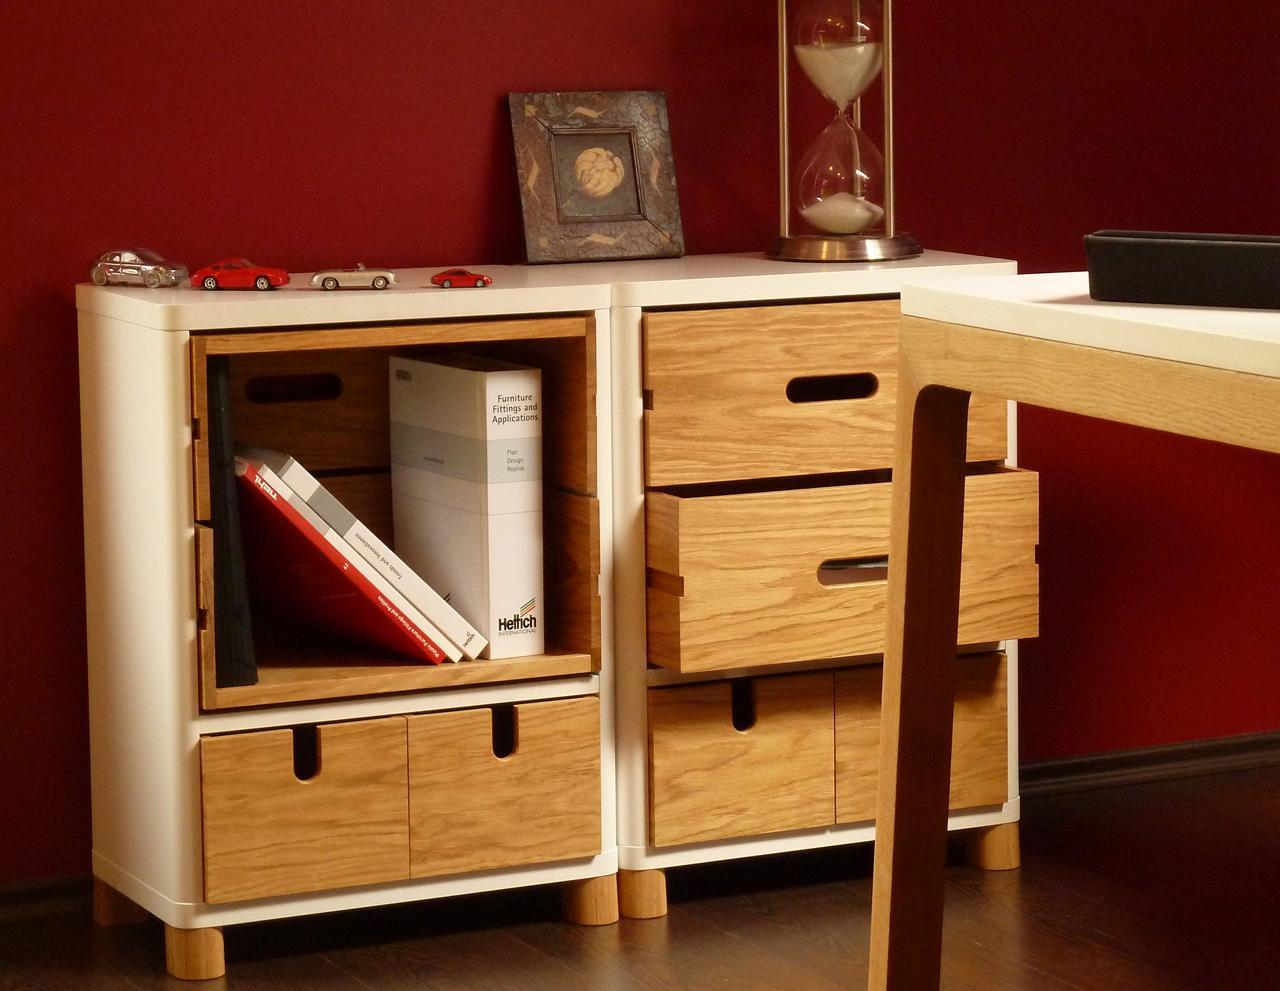 design kommode in wei und holz cow. Black Bedroom Furniture Sets. Home Design Ideas